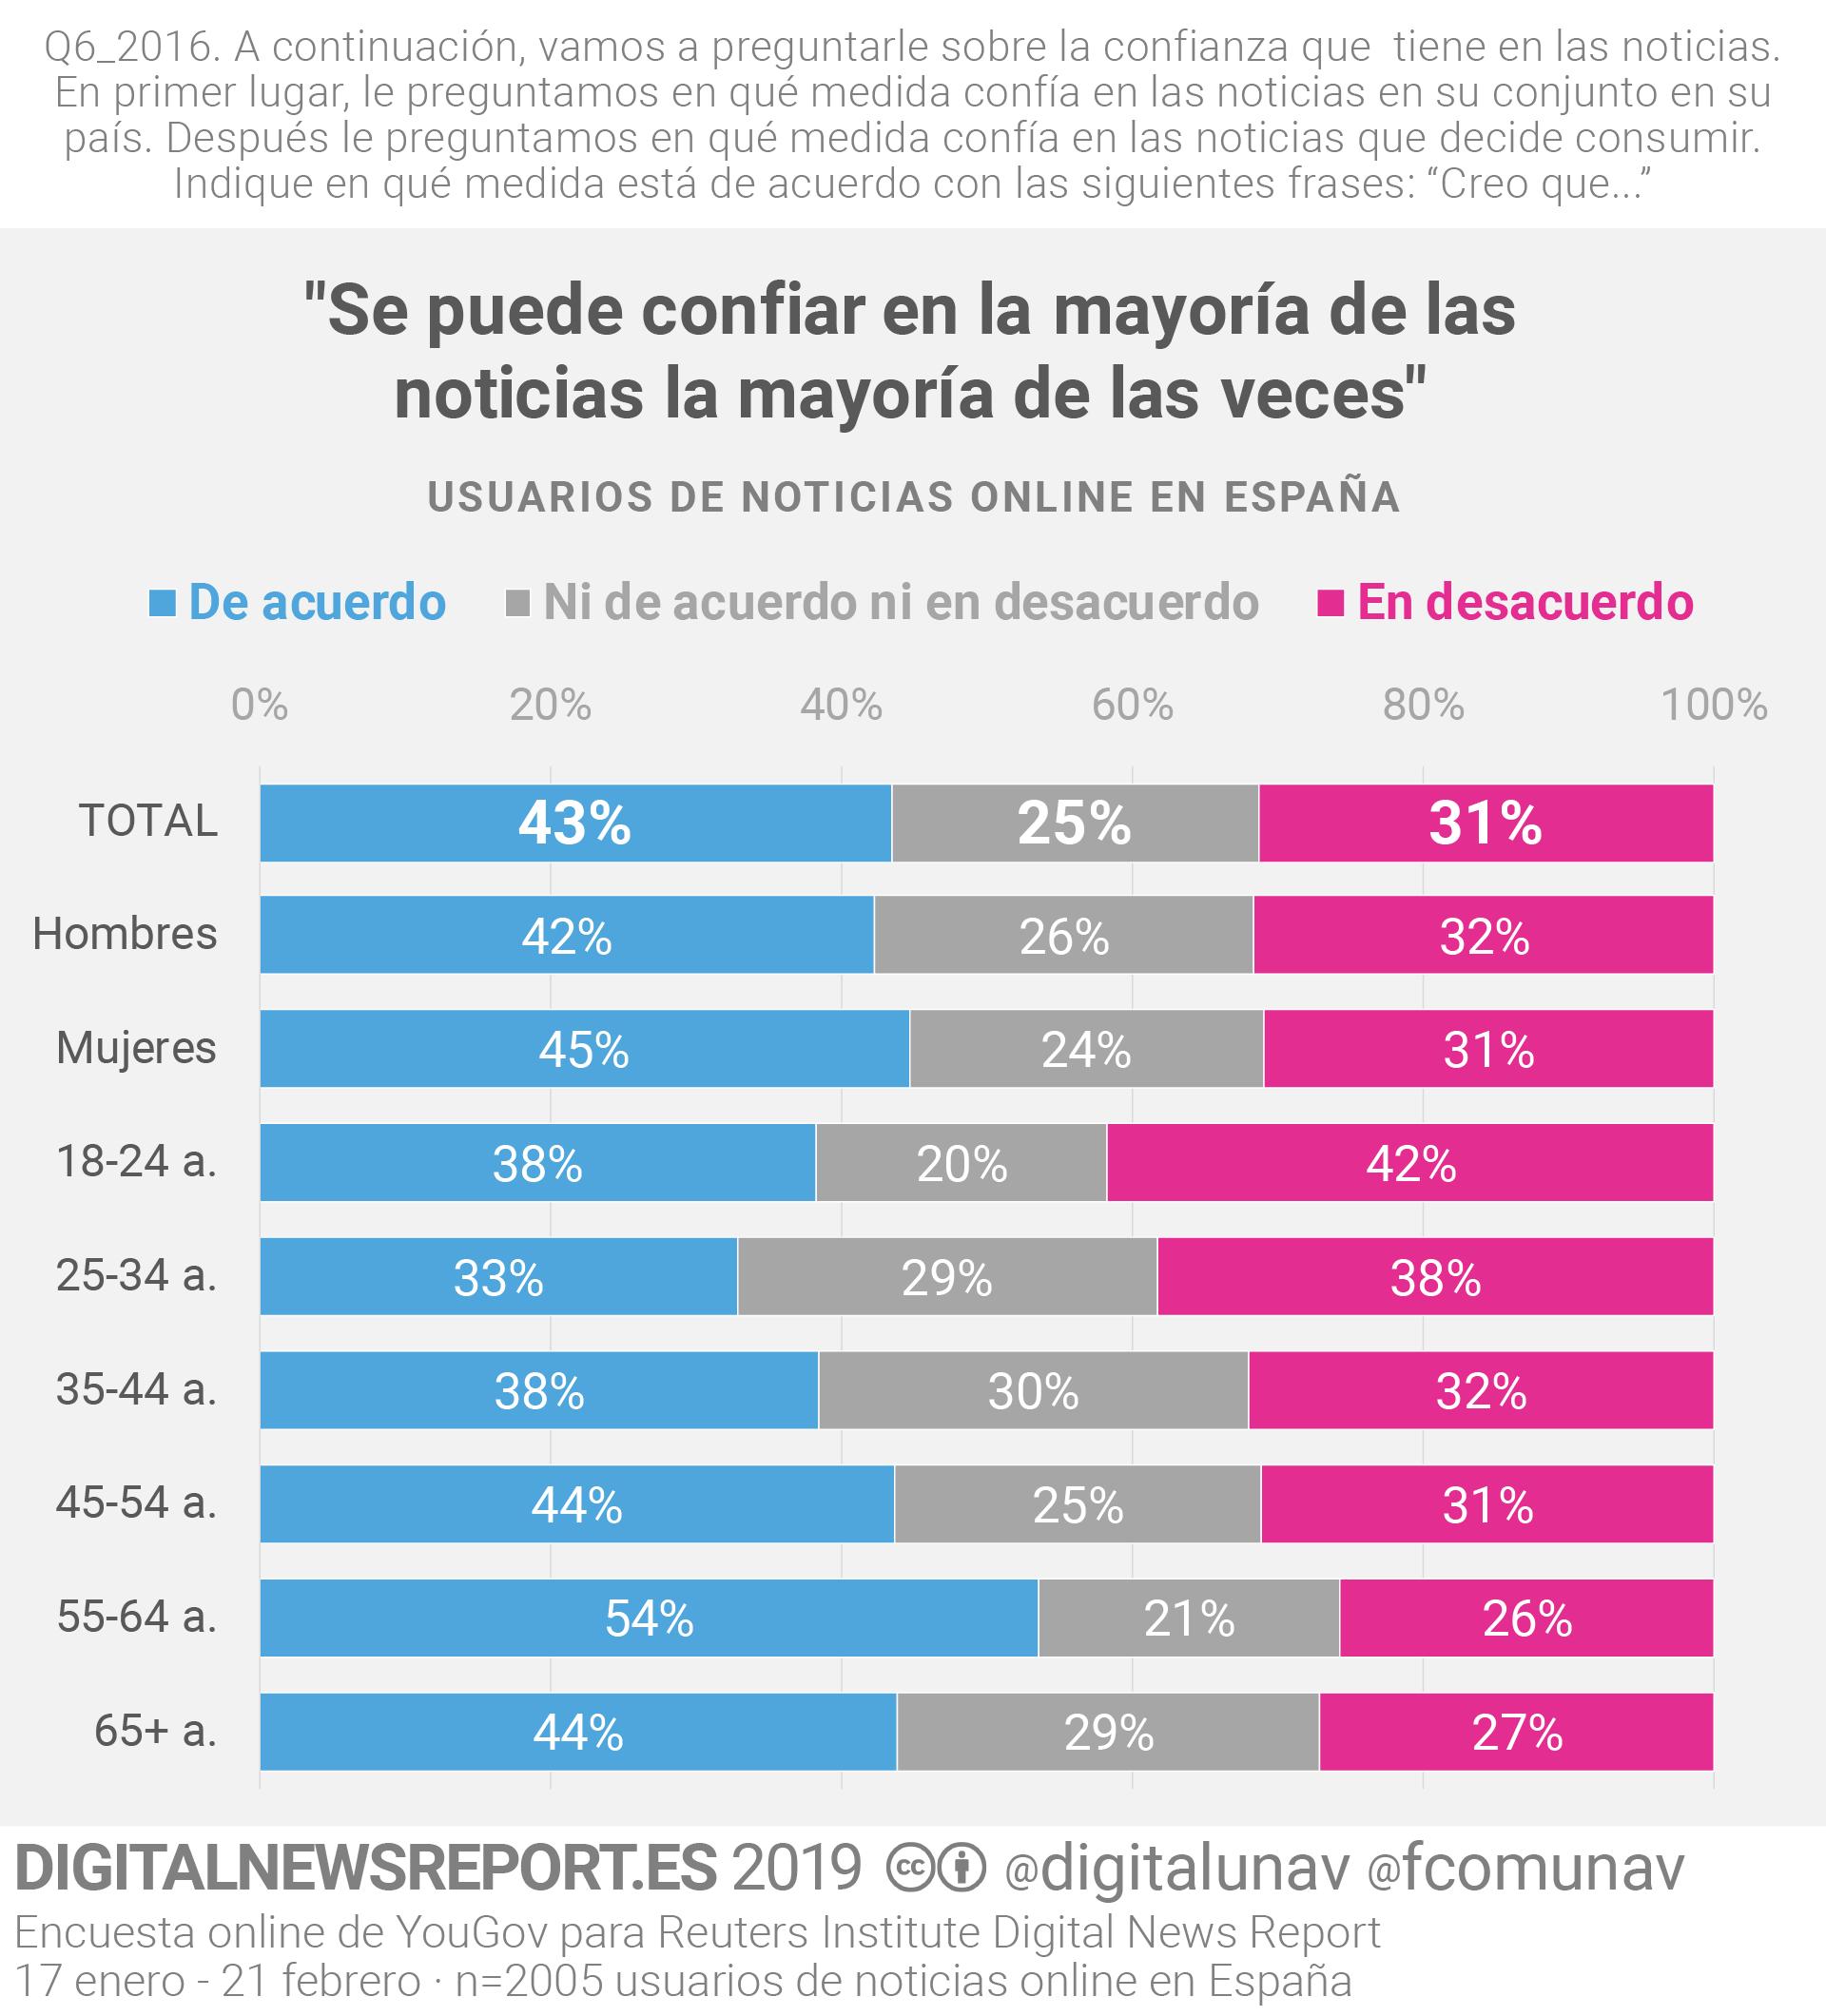 DNR_2019_confianza_general_sociodem